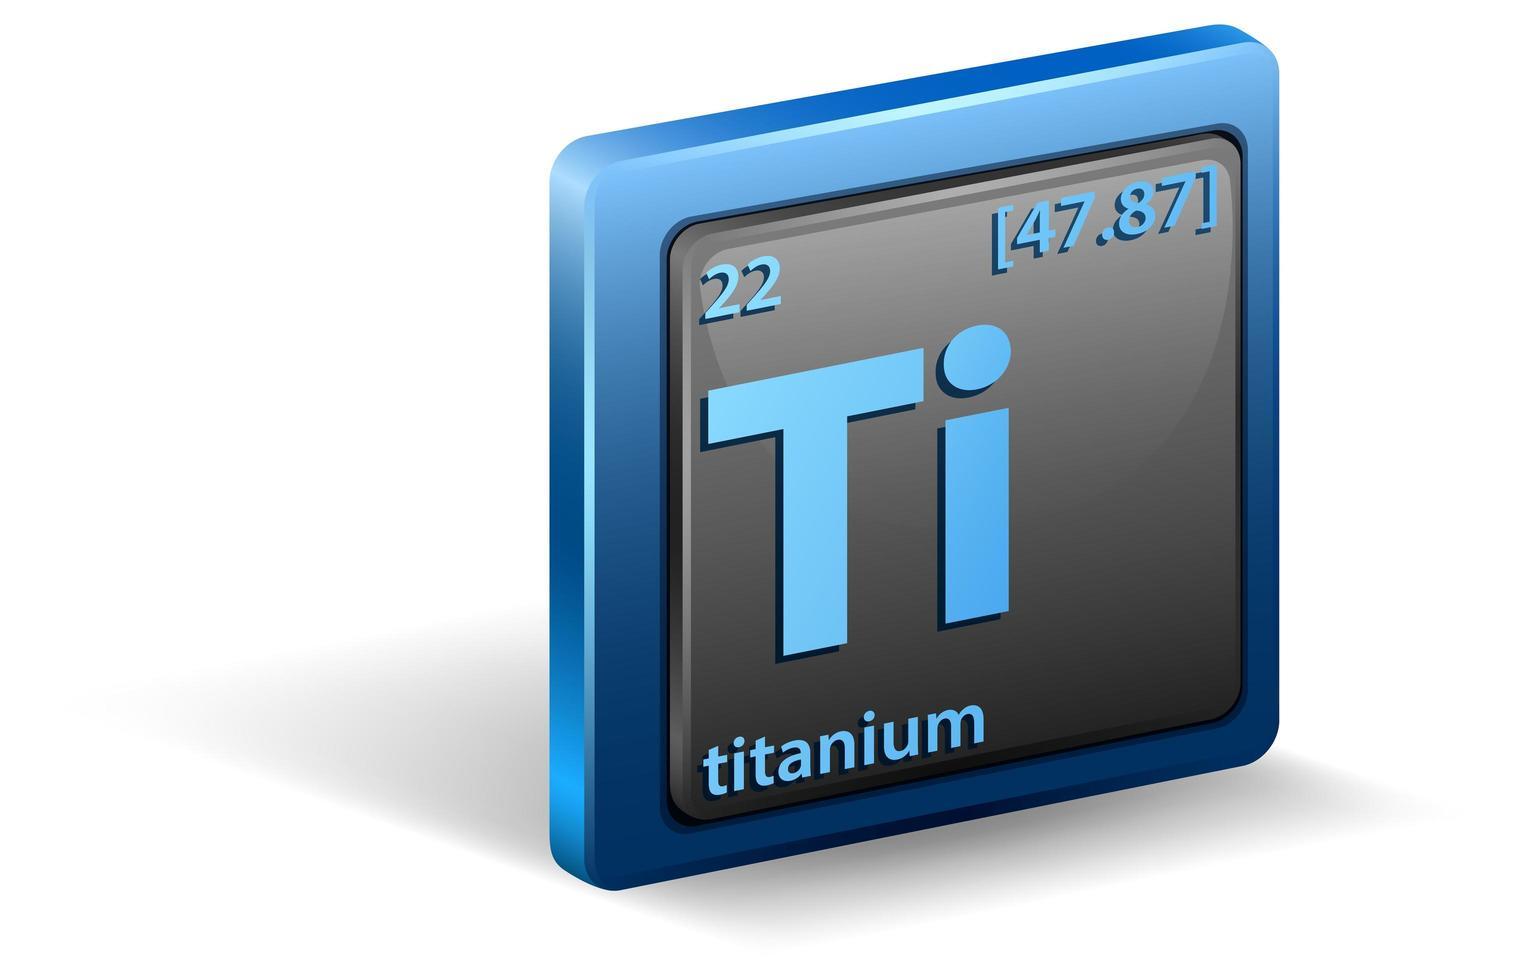 titanium scheikundig element. chemisch symbool met atoomnummer en atoommassa. vector